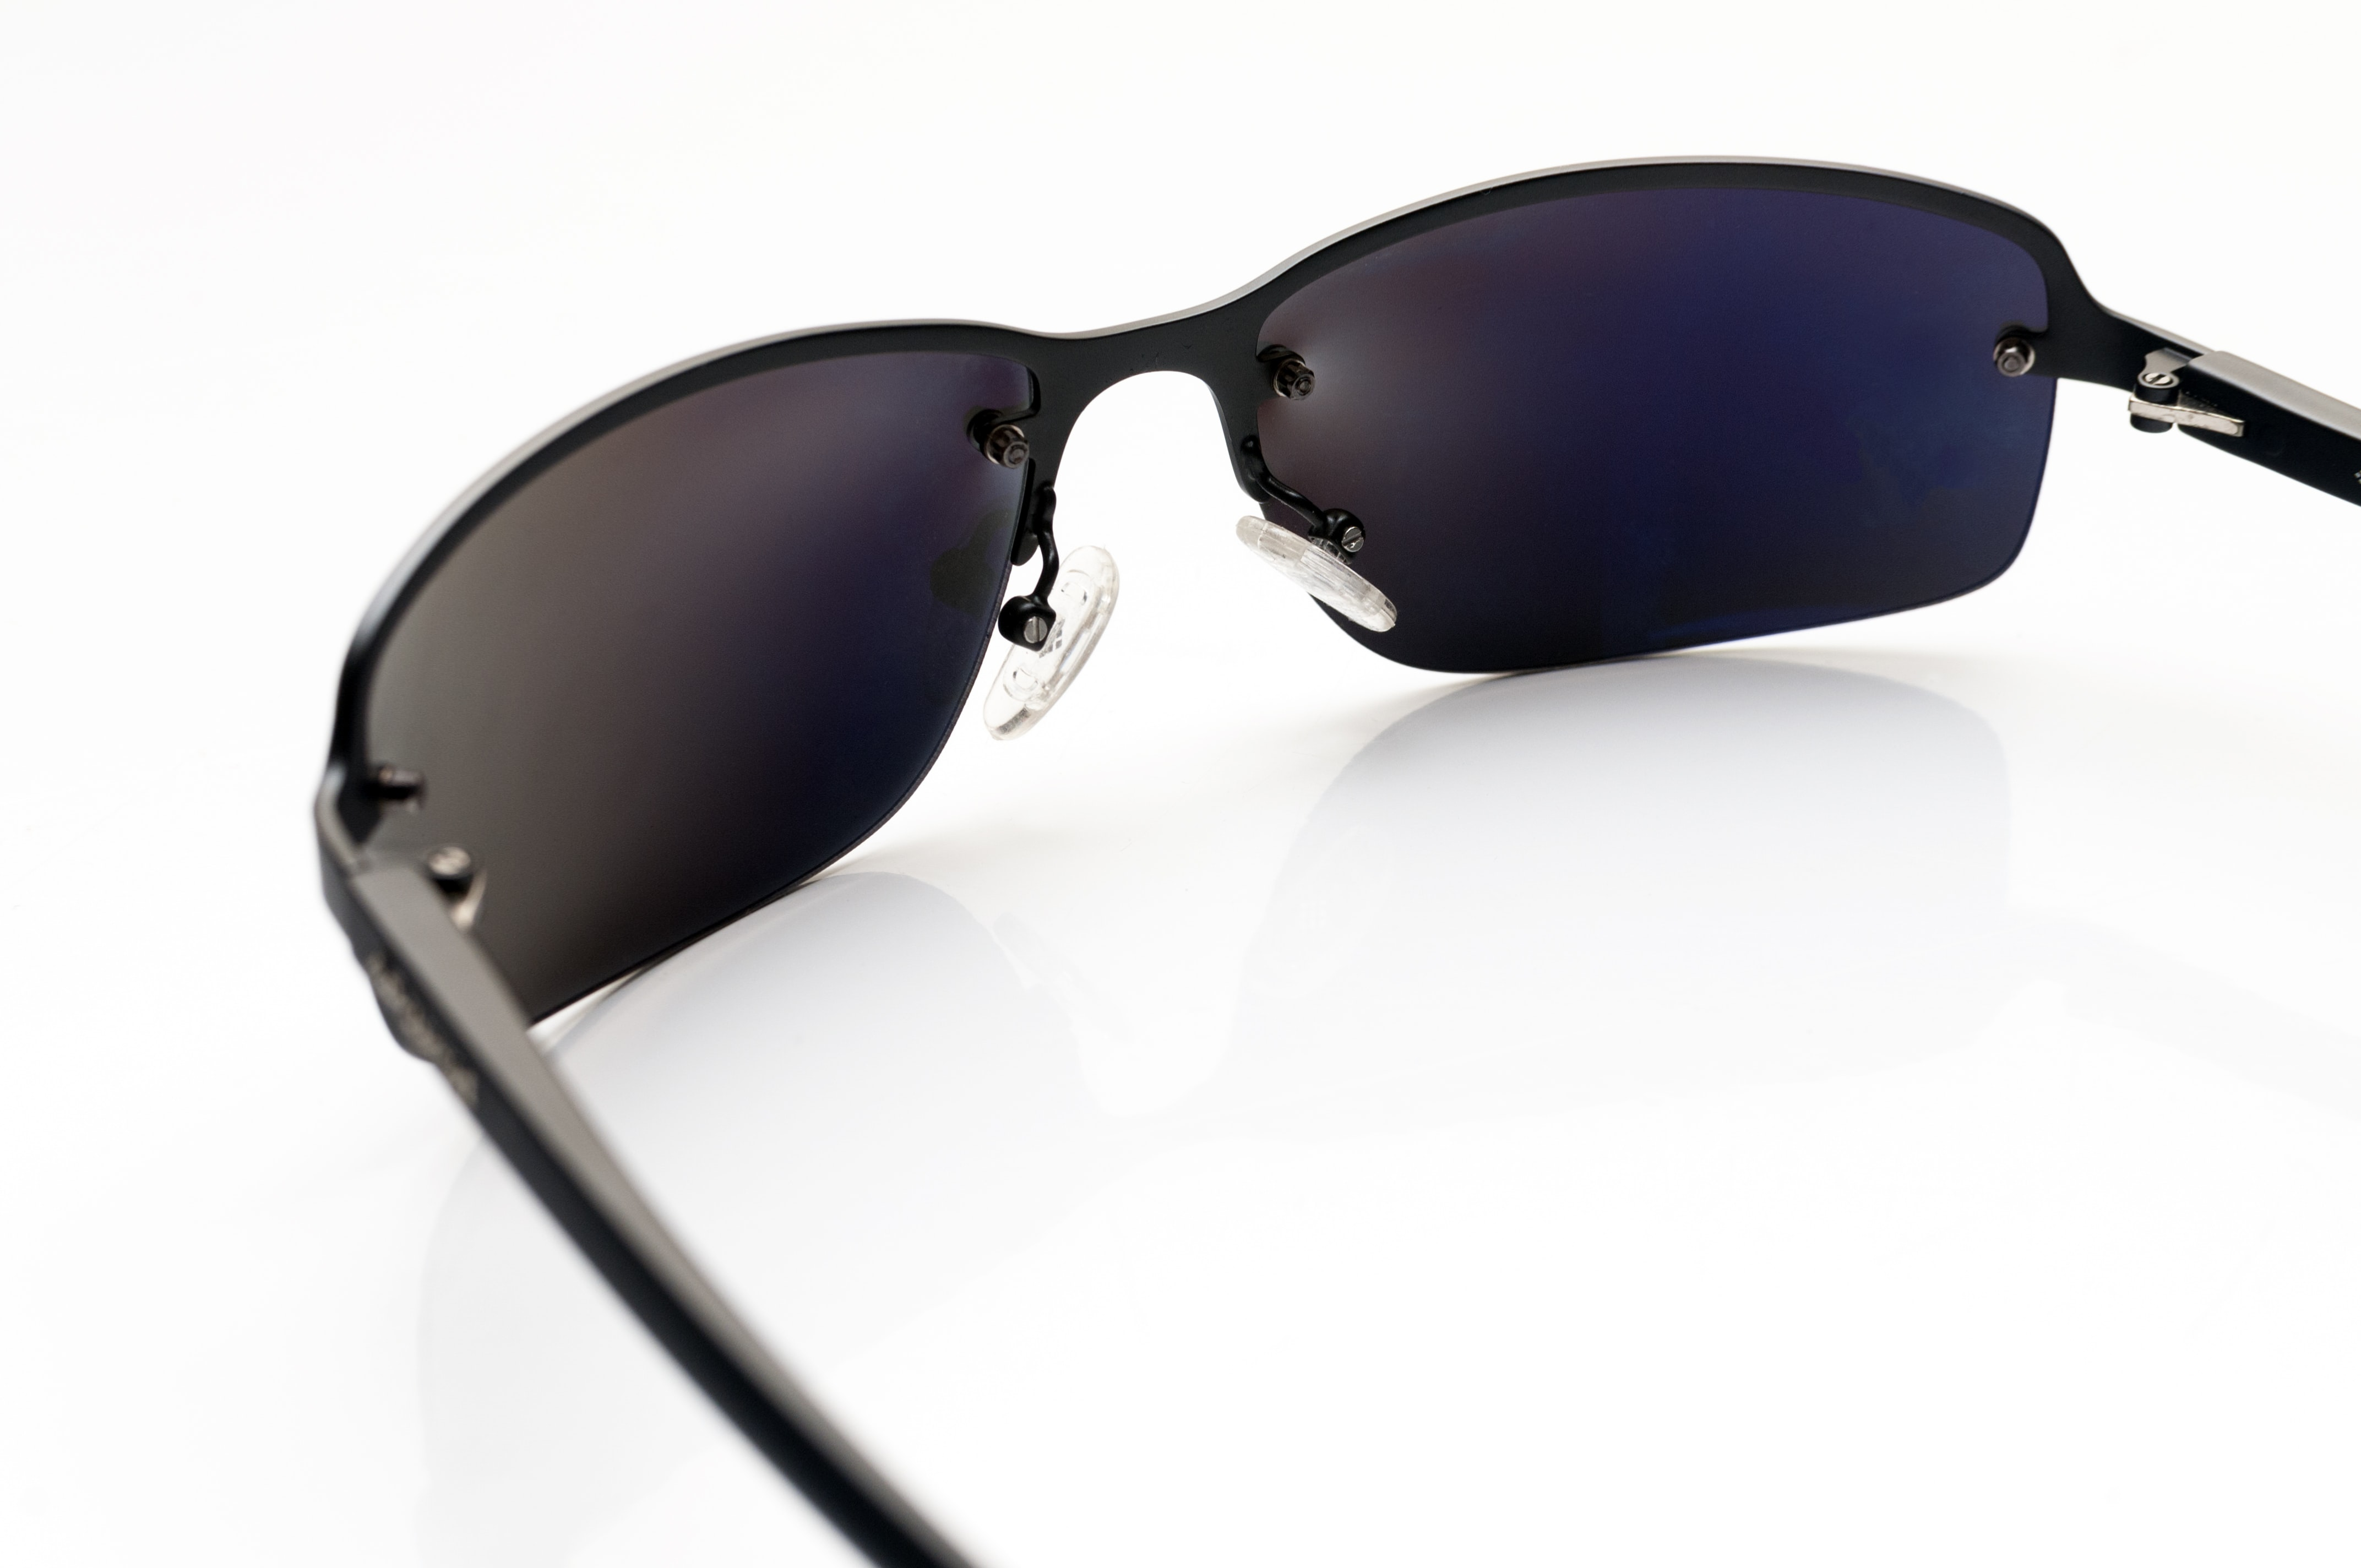 black sunglasses in white background